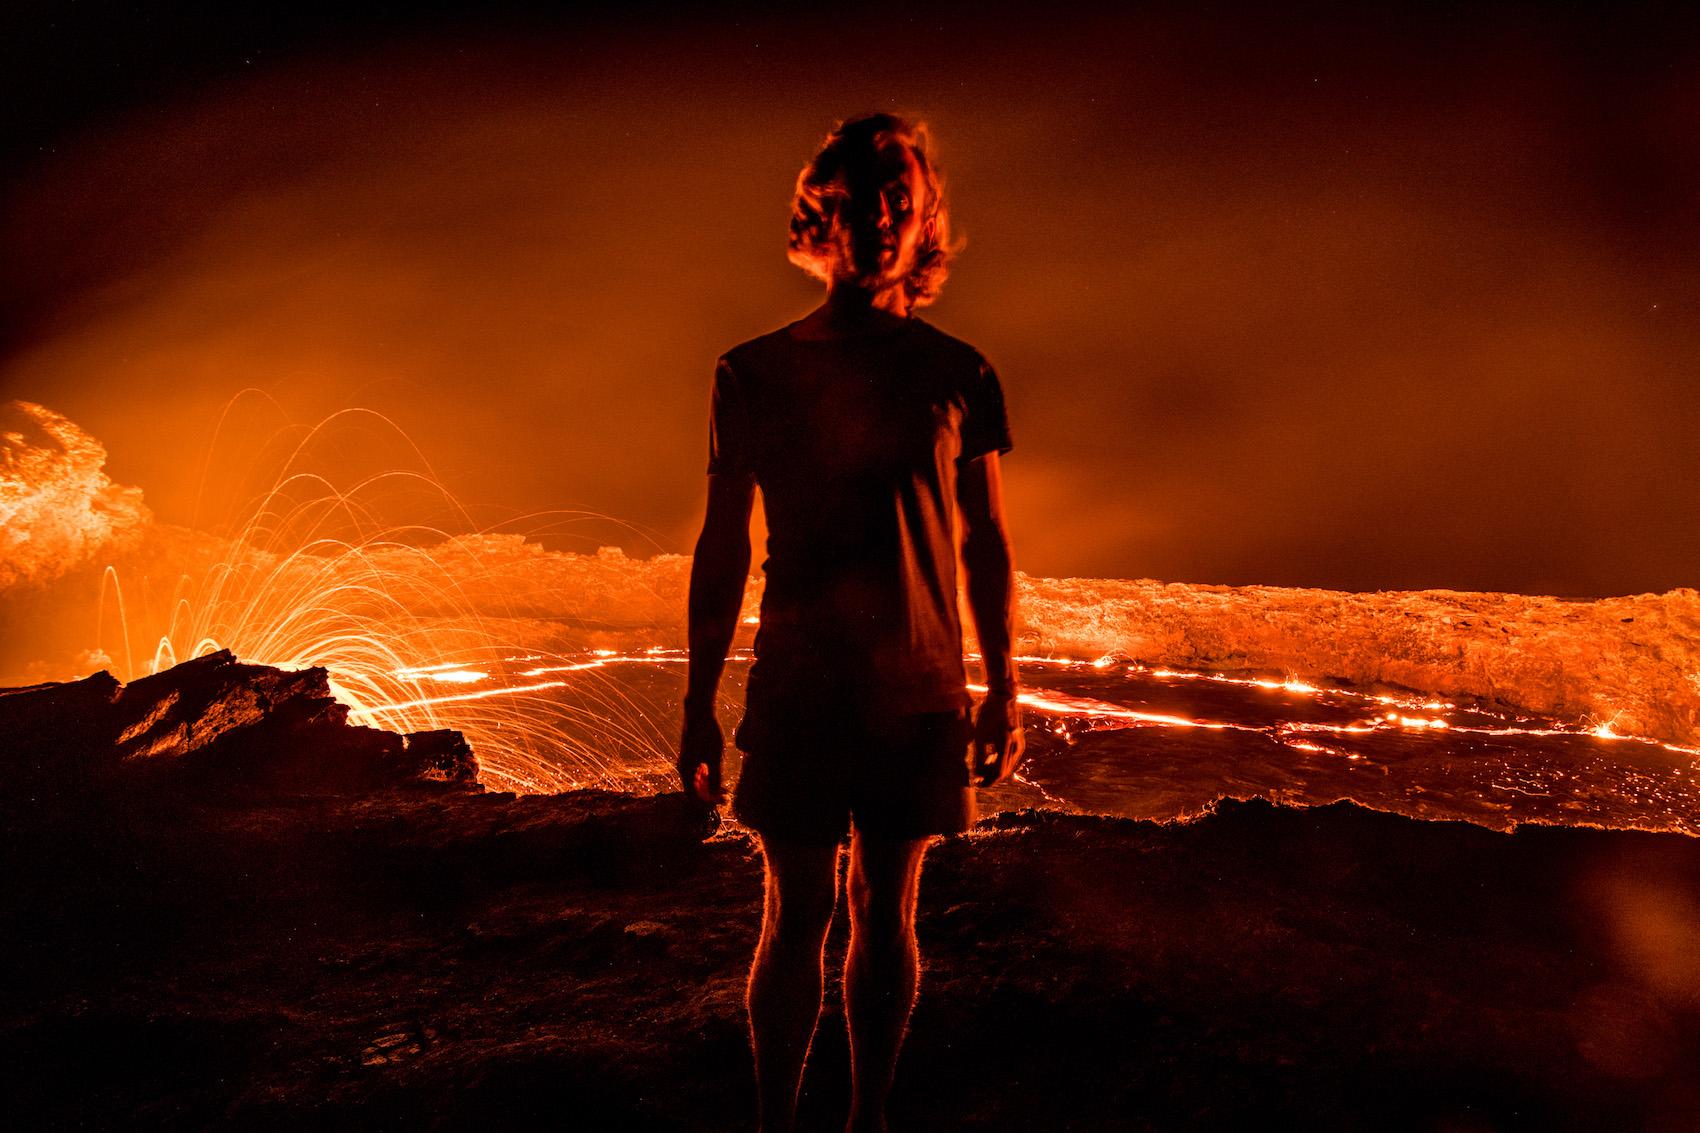 Robert Schrader at Ethiopia's Erta Ale Volcano